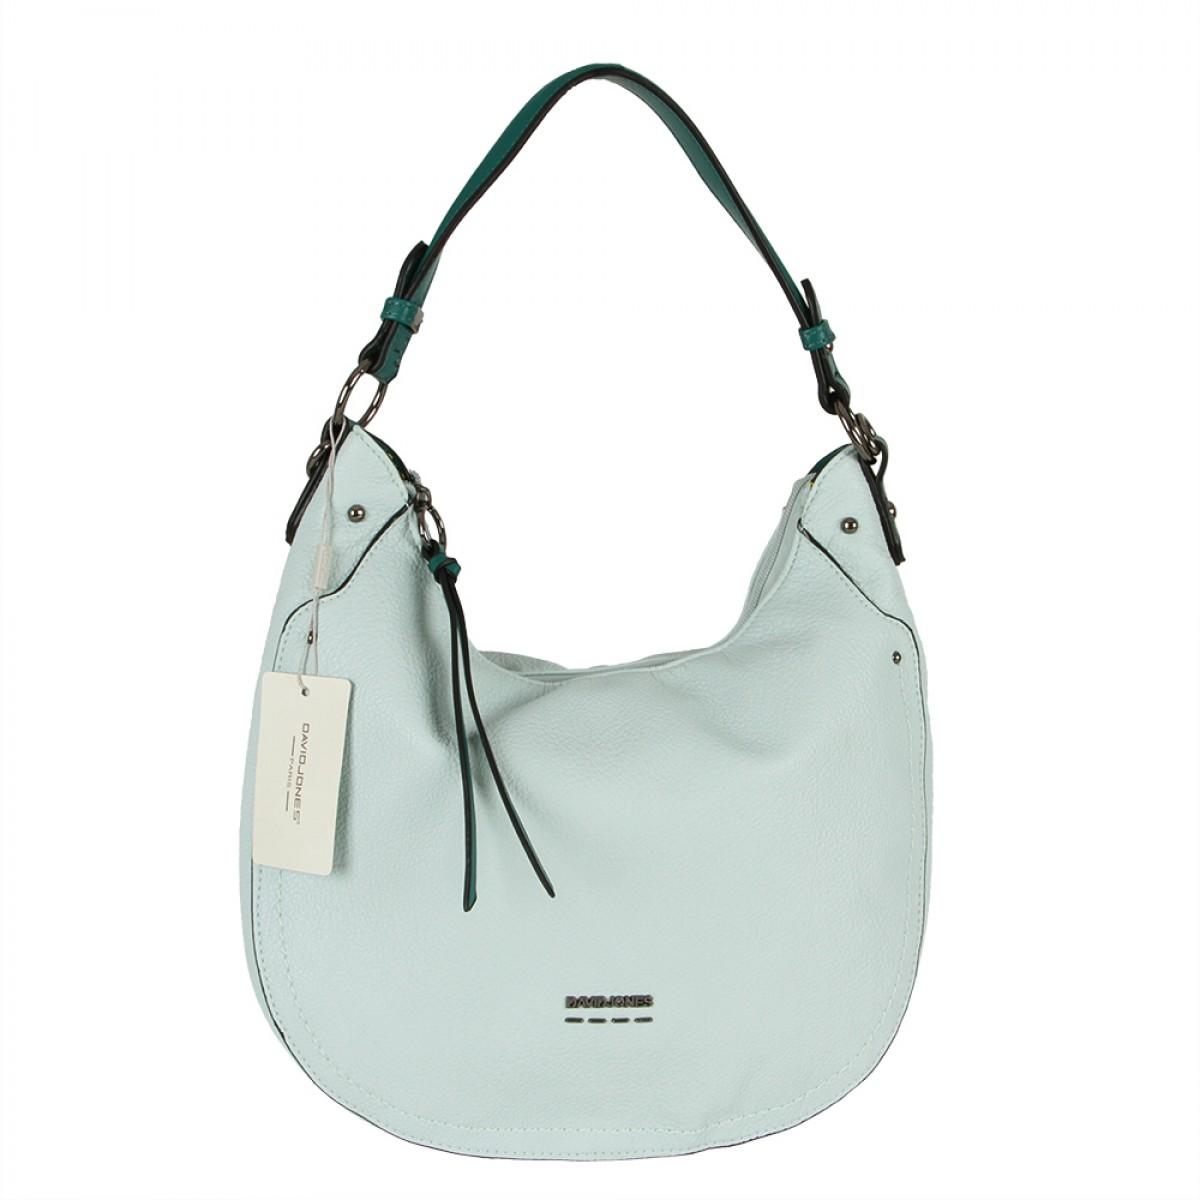 Жіноча сумка David Jones 6210-1 PALE GREEN